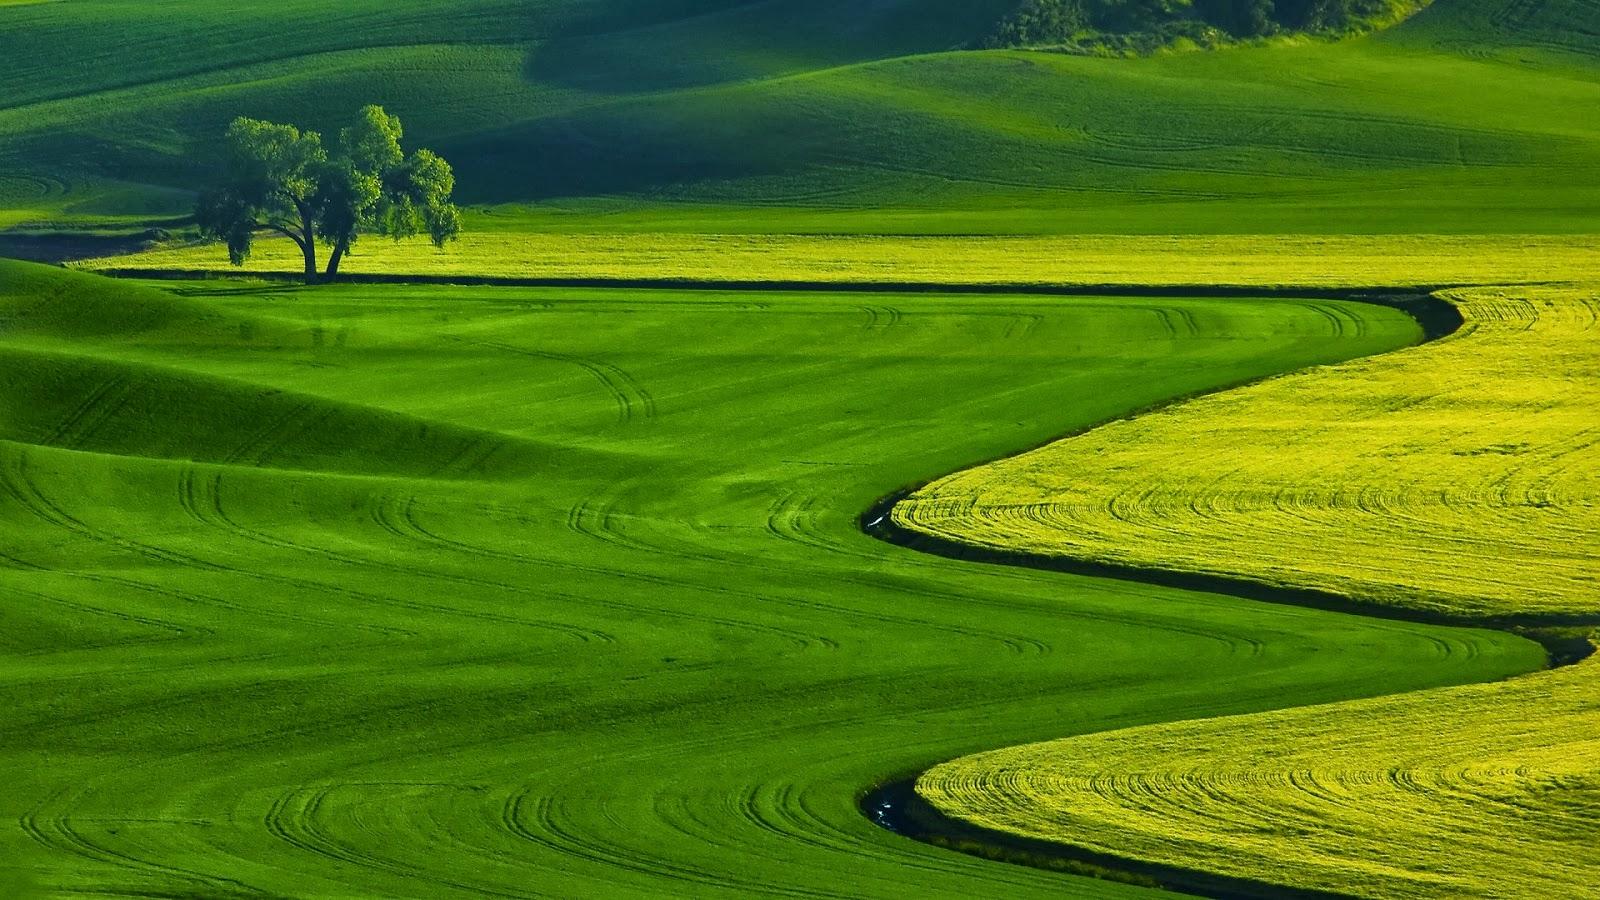 Hd wallpaper download for laptop - Full Hd Nature Wallpapers Free Download Full Hd Nature Wallpapers Free